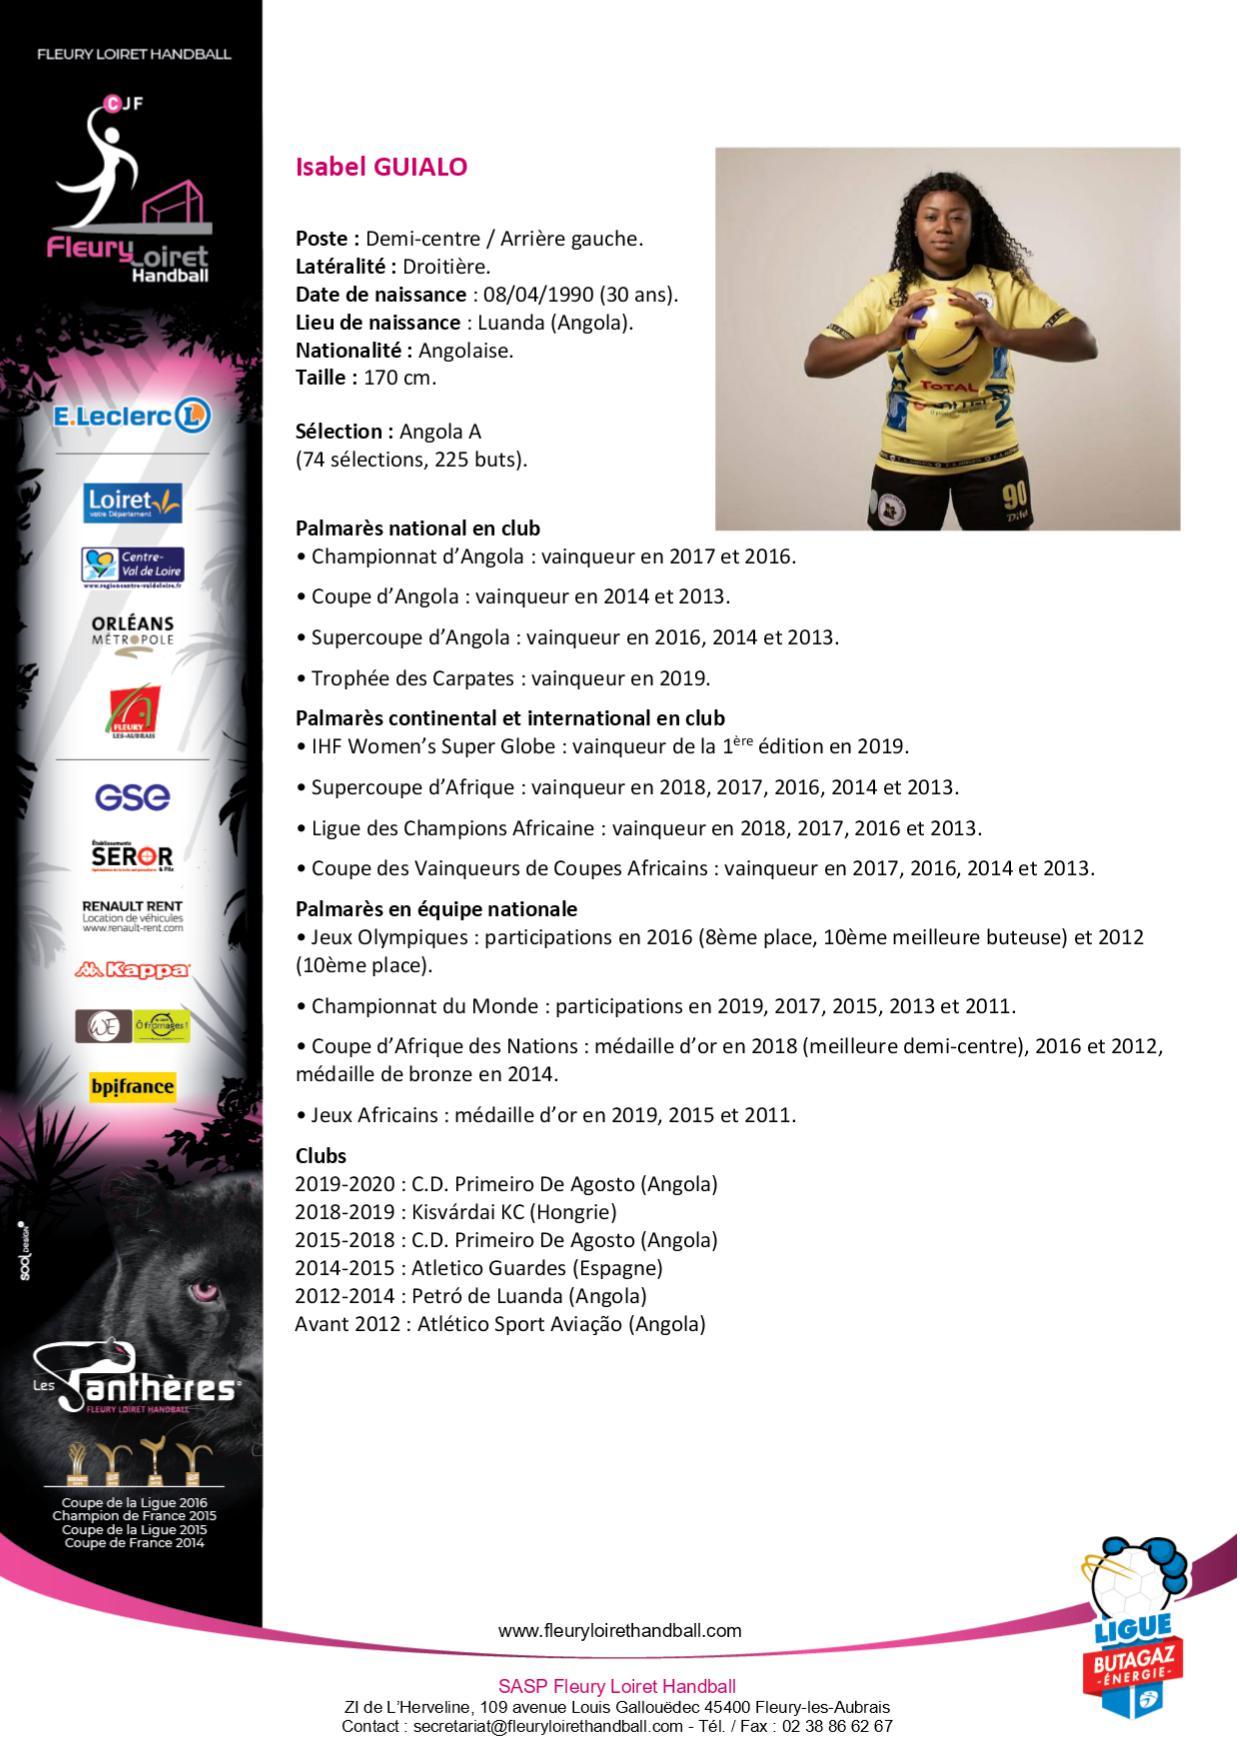 Aout 2015 - Communiqué Fleury Loiret Handball - Mercredi 29 avril 20202.jpg